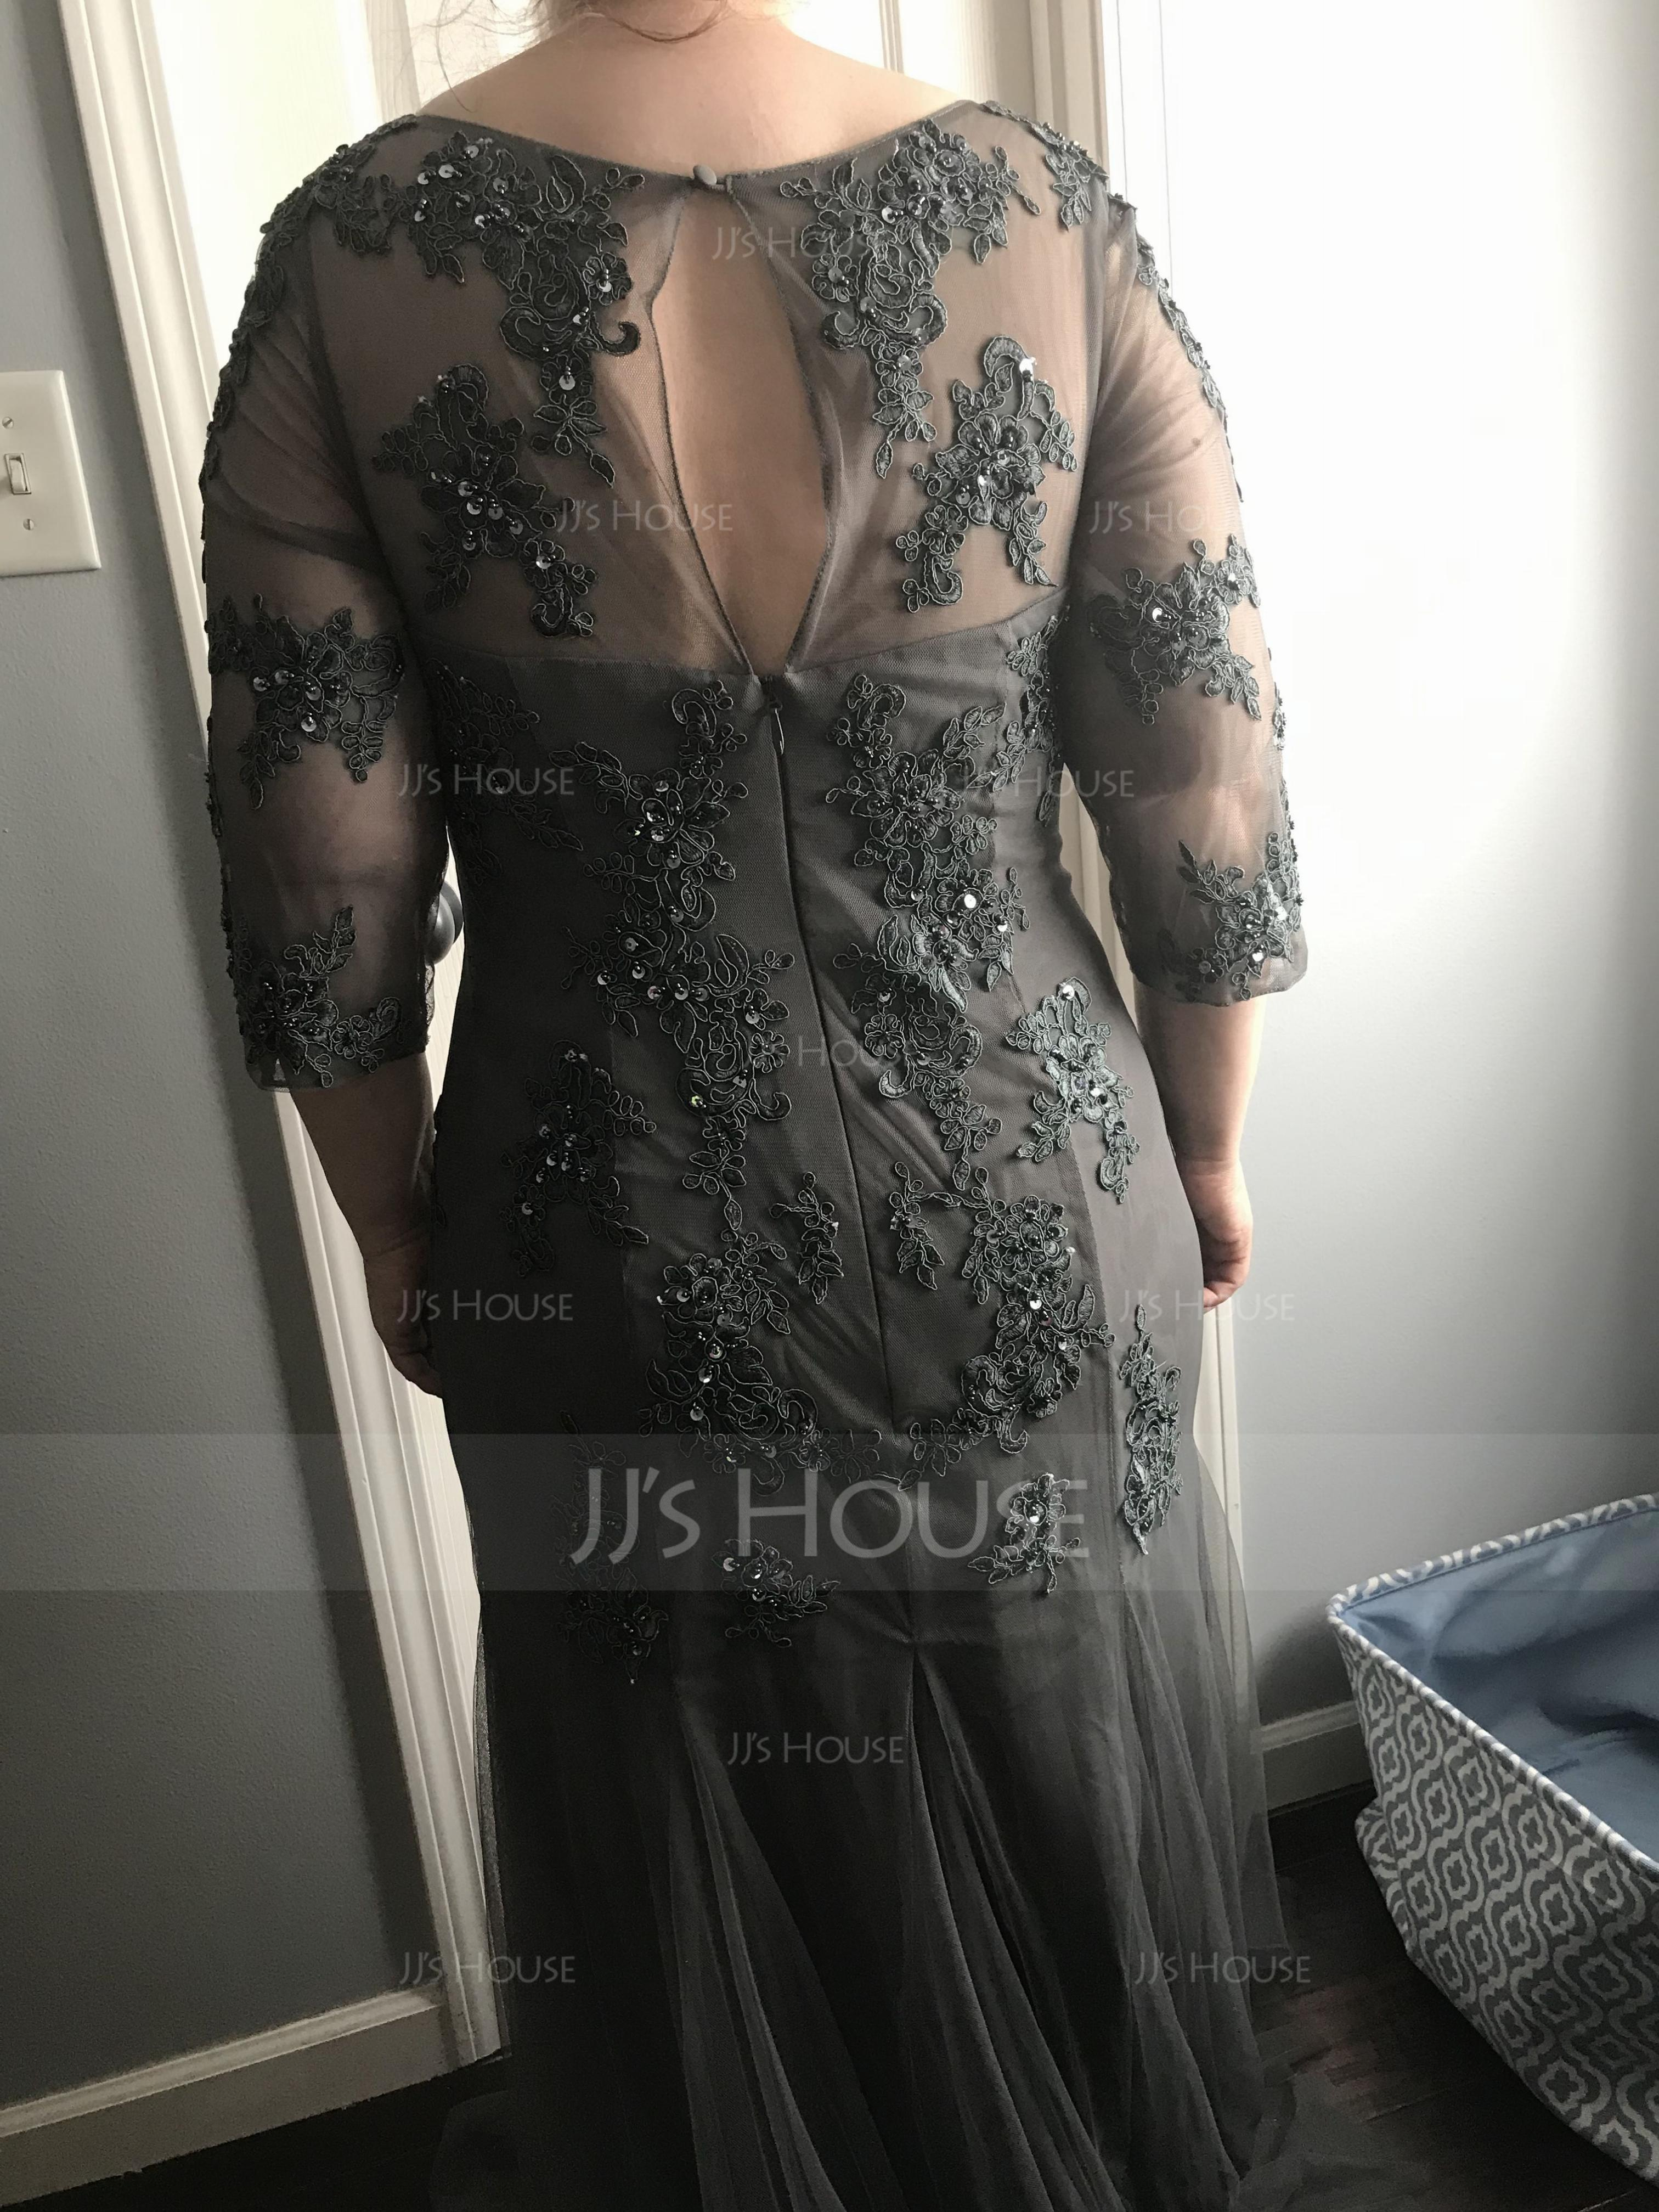 A-formet/Prinsesse Scoop Hals Gulvlengde Tyll Kjole til brudens mor med Profilering paljetter (008091961)